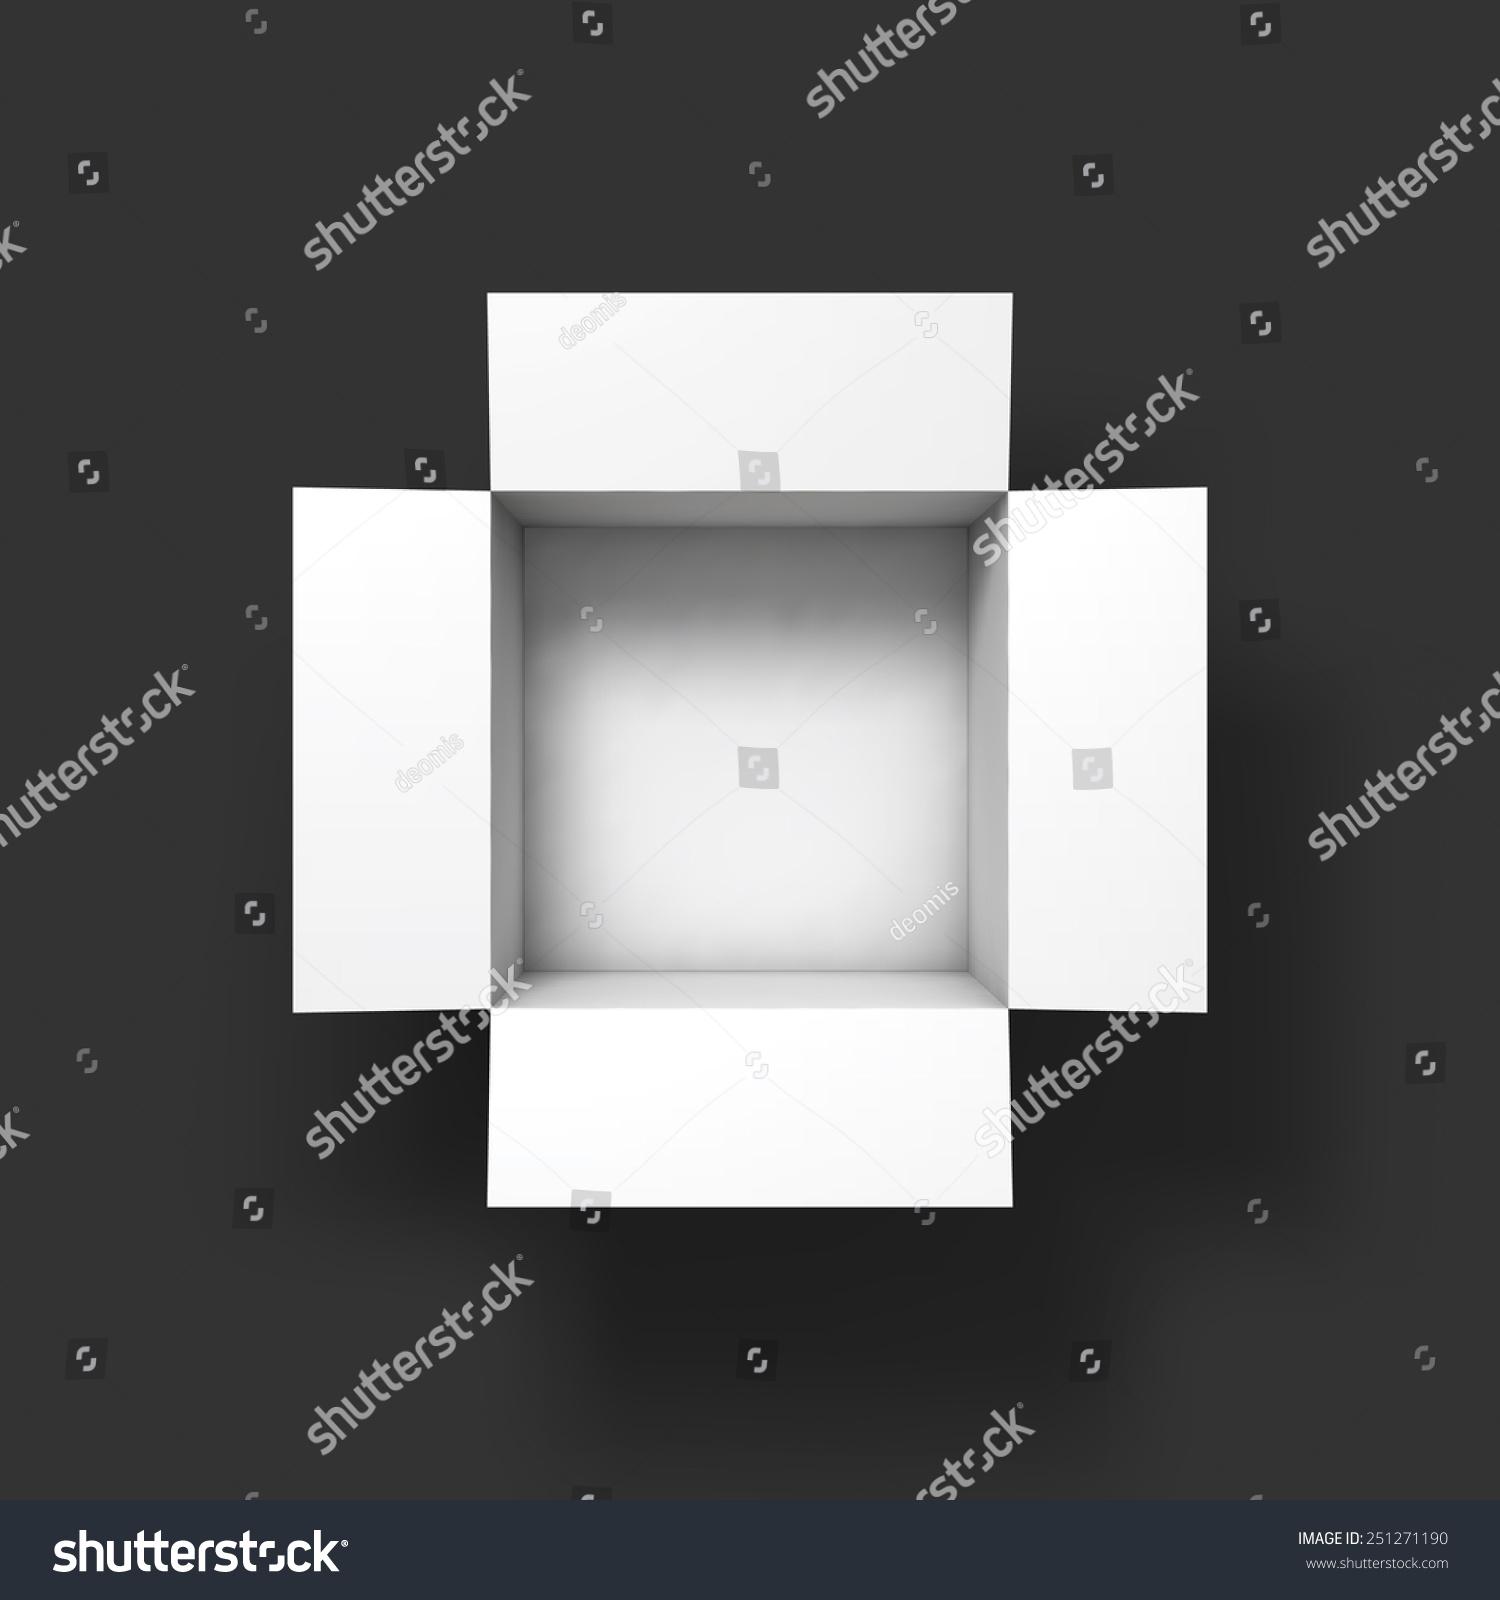 open box mockup template top view vector illustration eps10 251271190 shutterstock. Black Bedroom Furniture Sets. Home Design Ideas